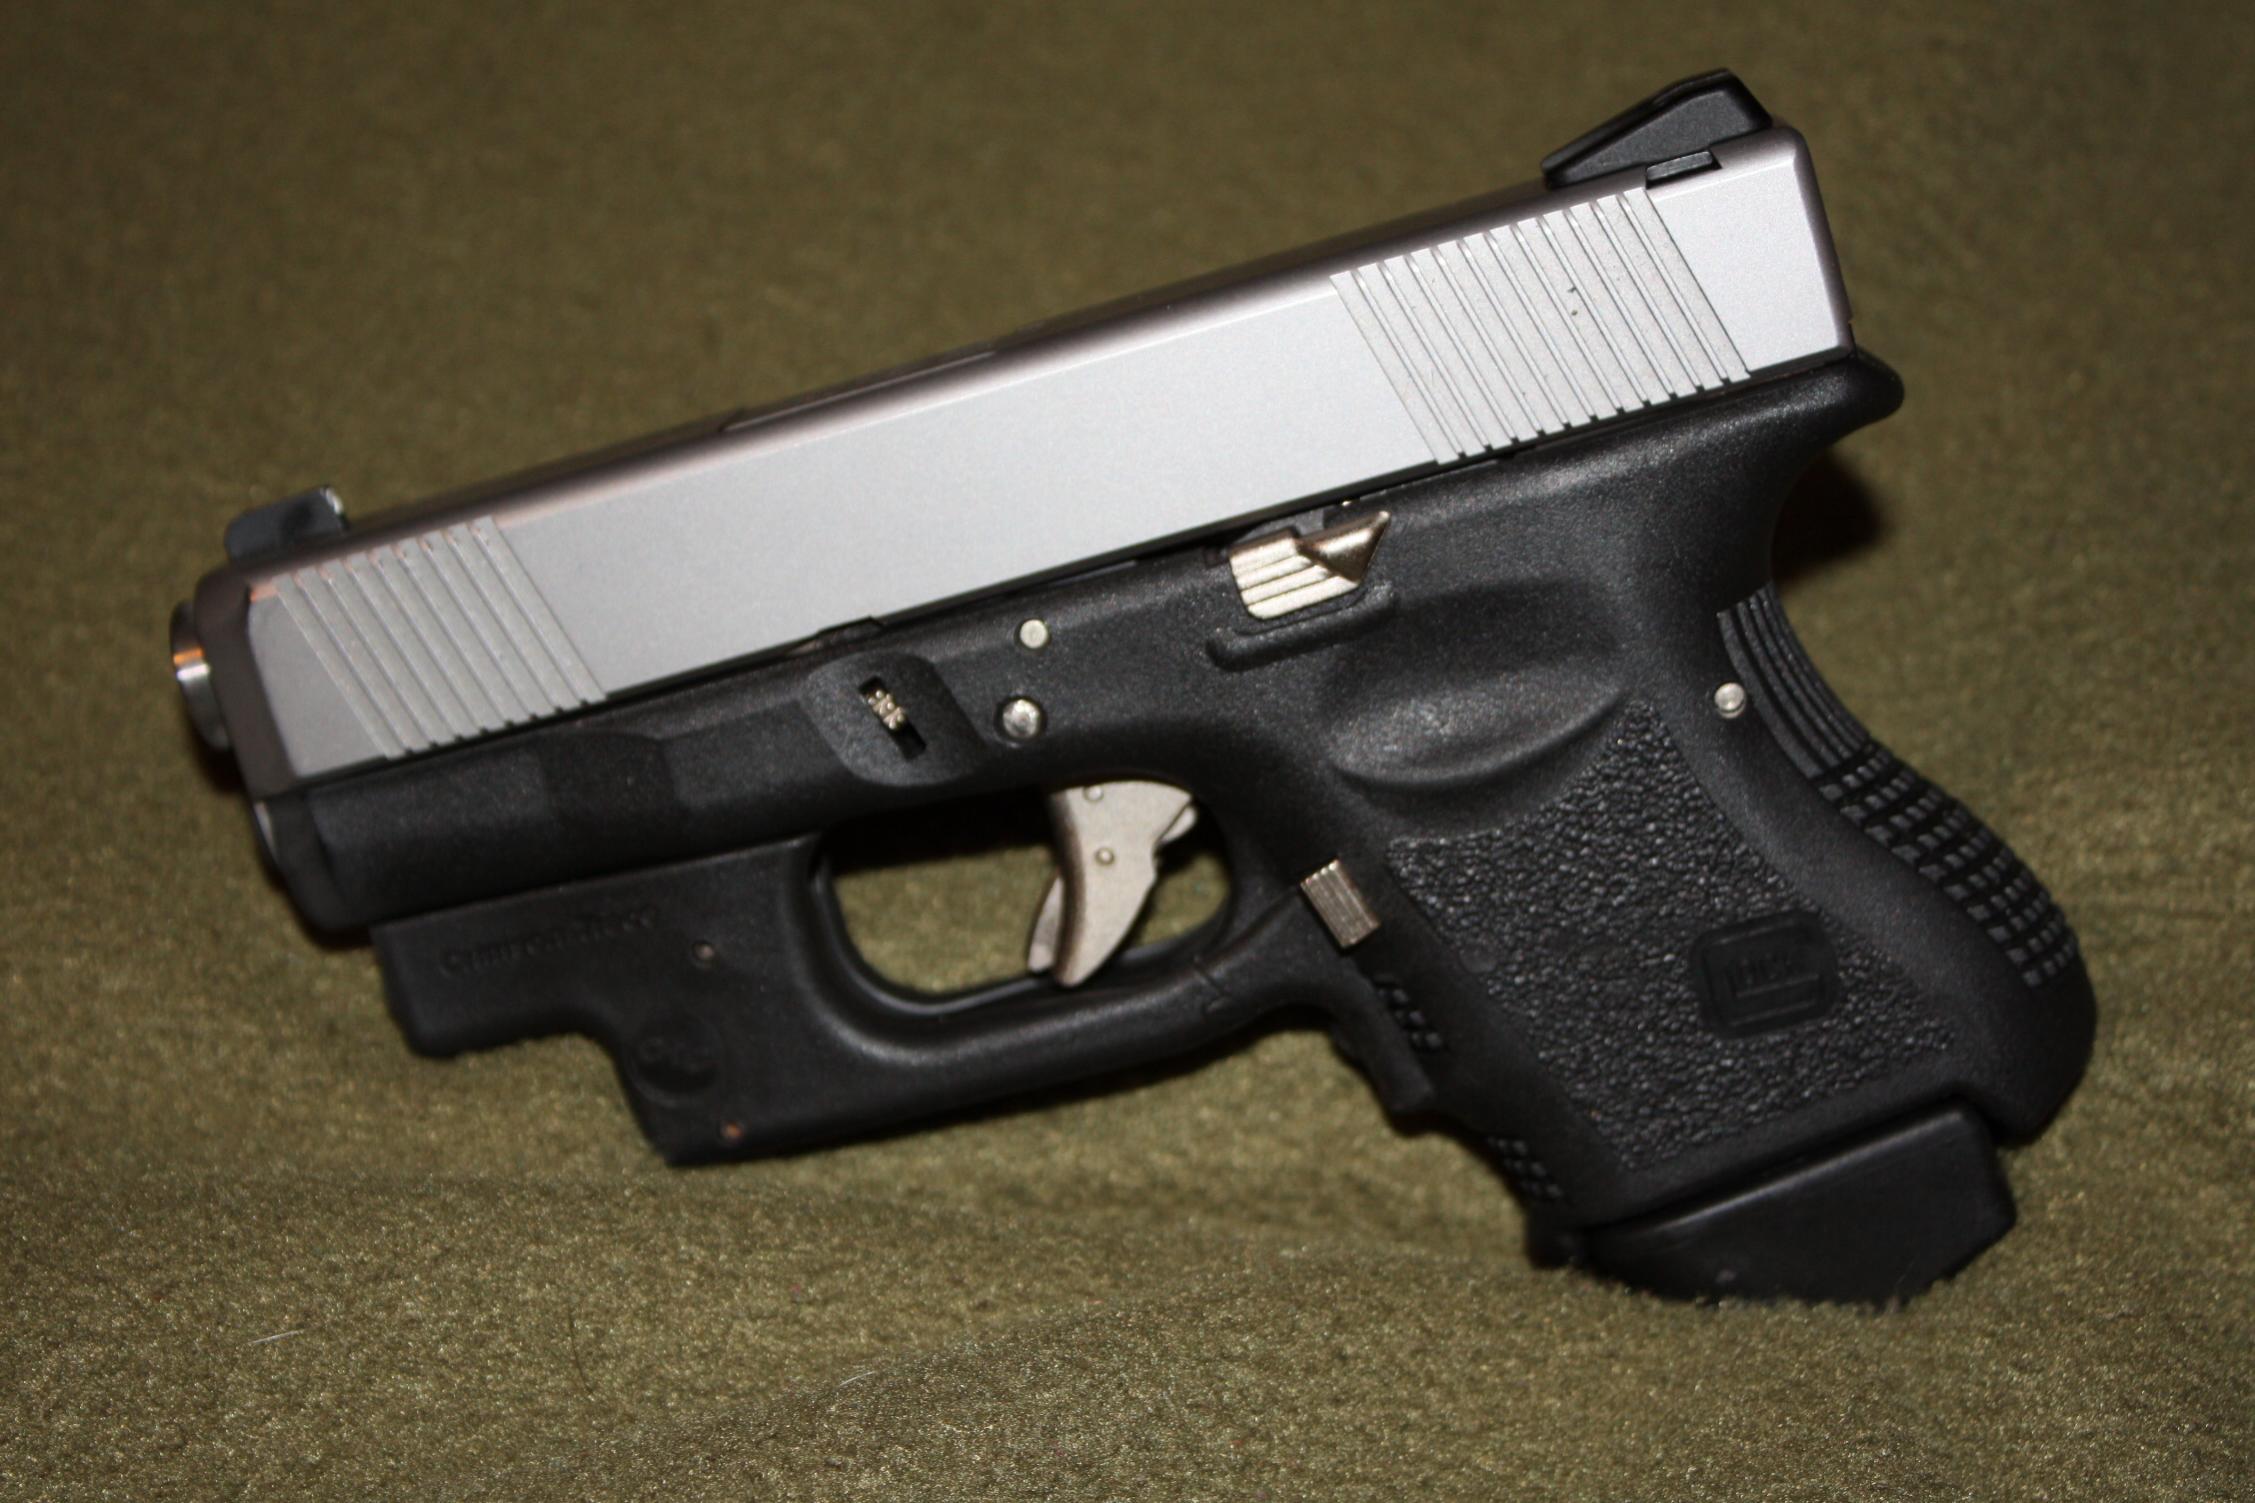 Glock 27, My Latest Project-img_1201.jpg